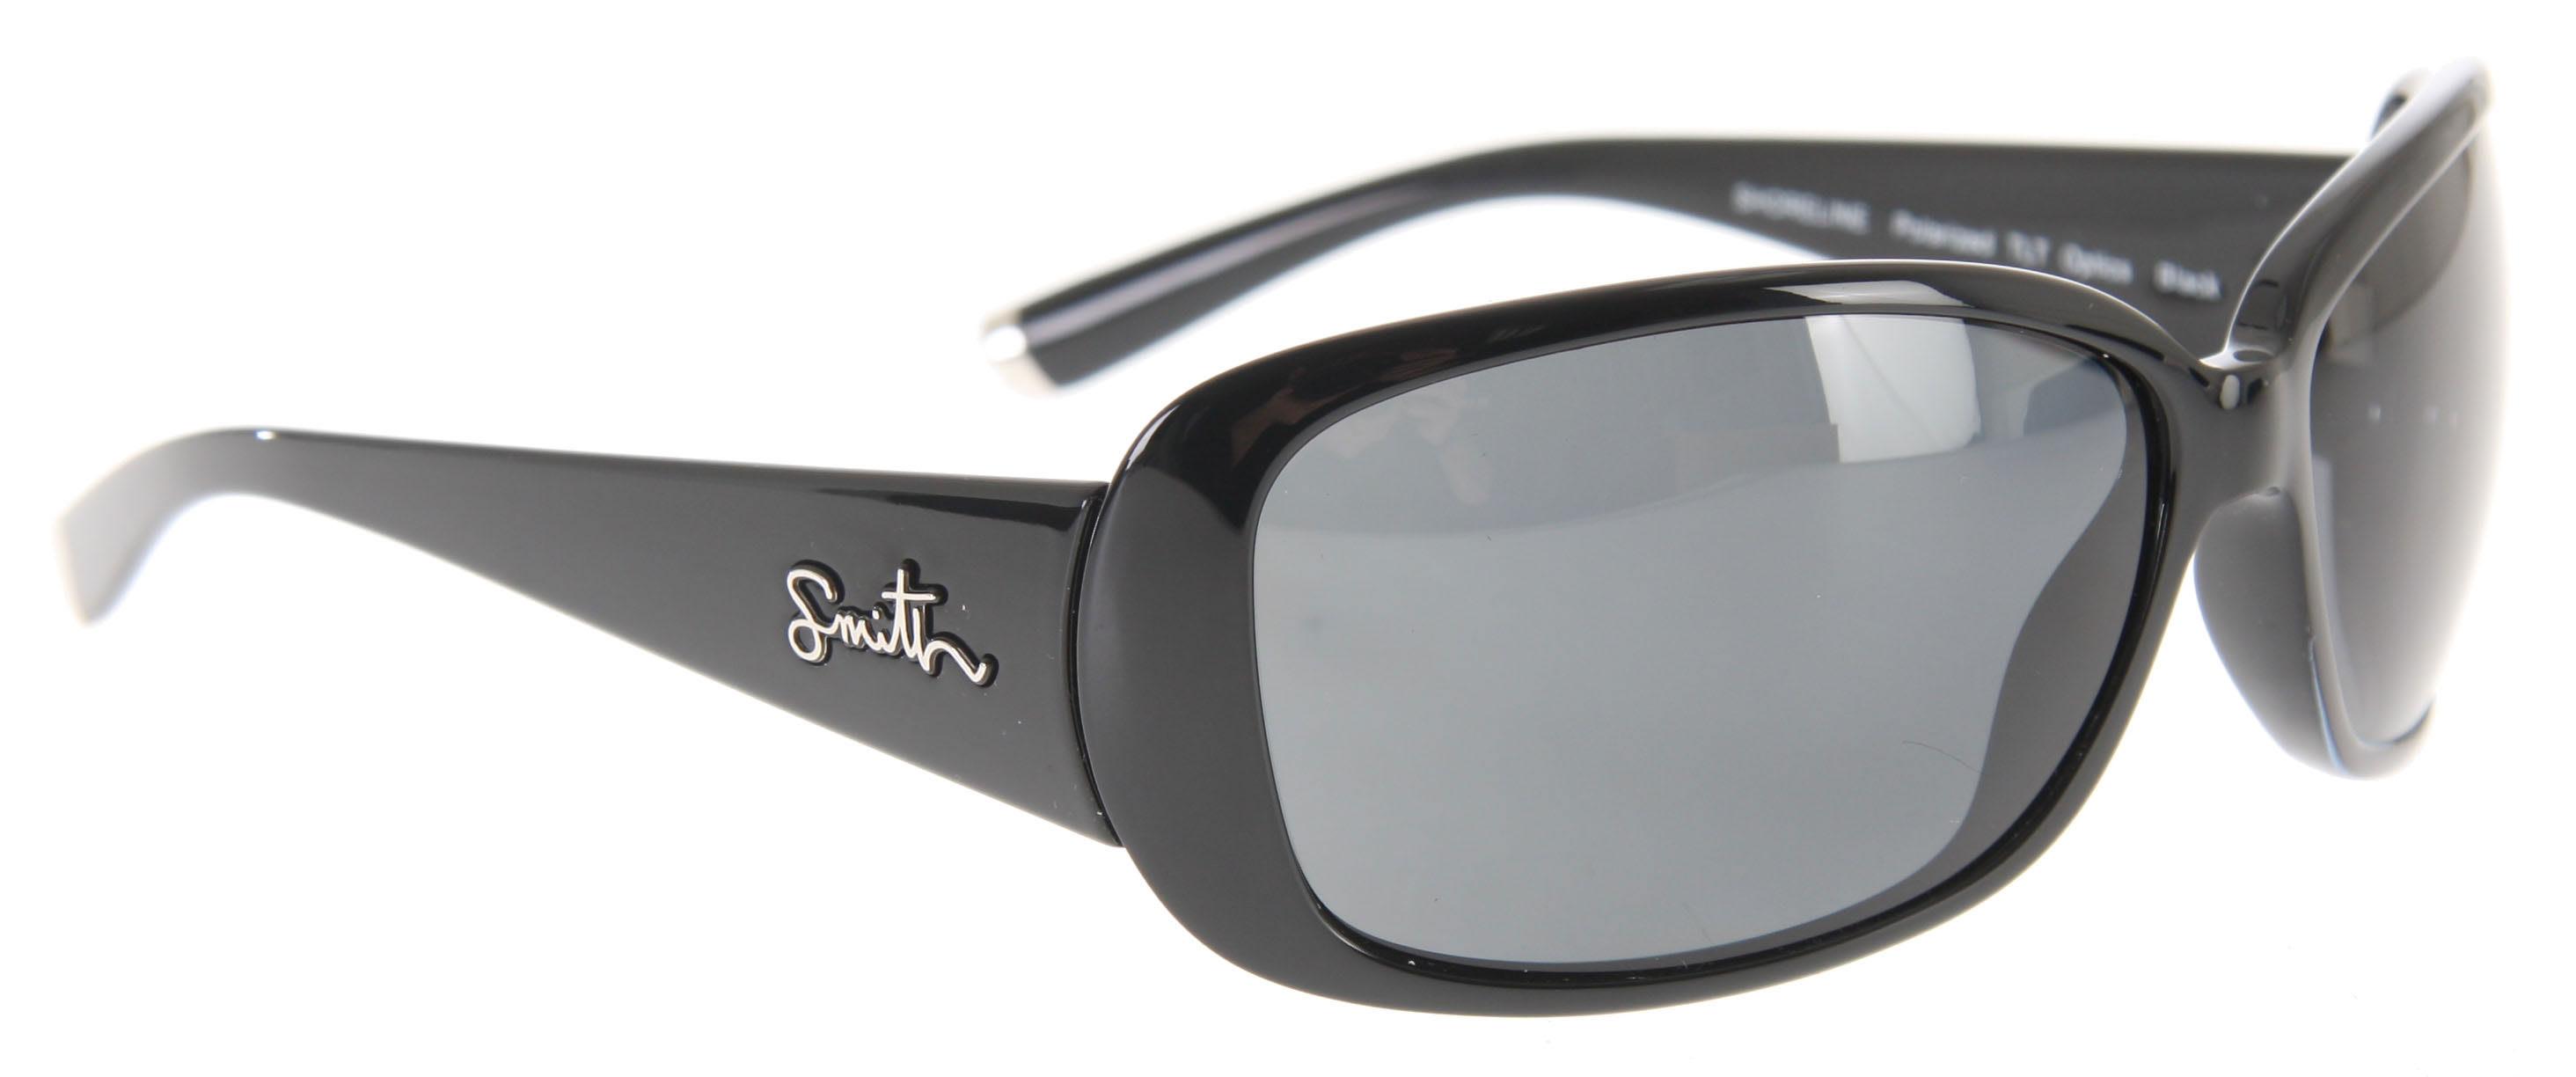 7de36527b38 Smith Shoreline Sunglasses - thumbnail 1